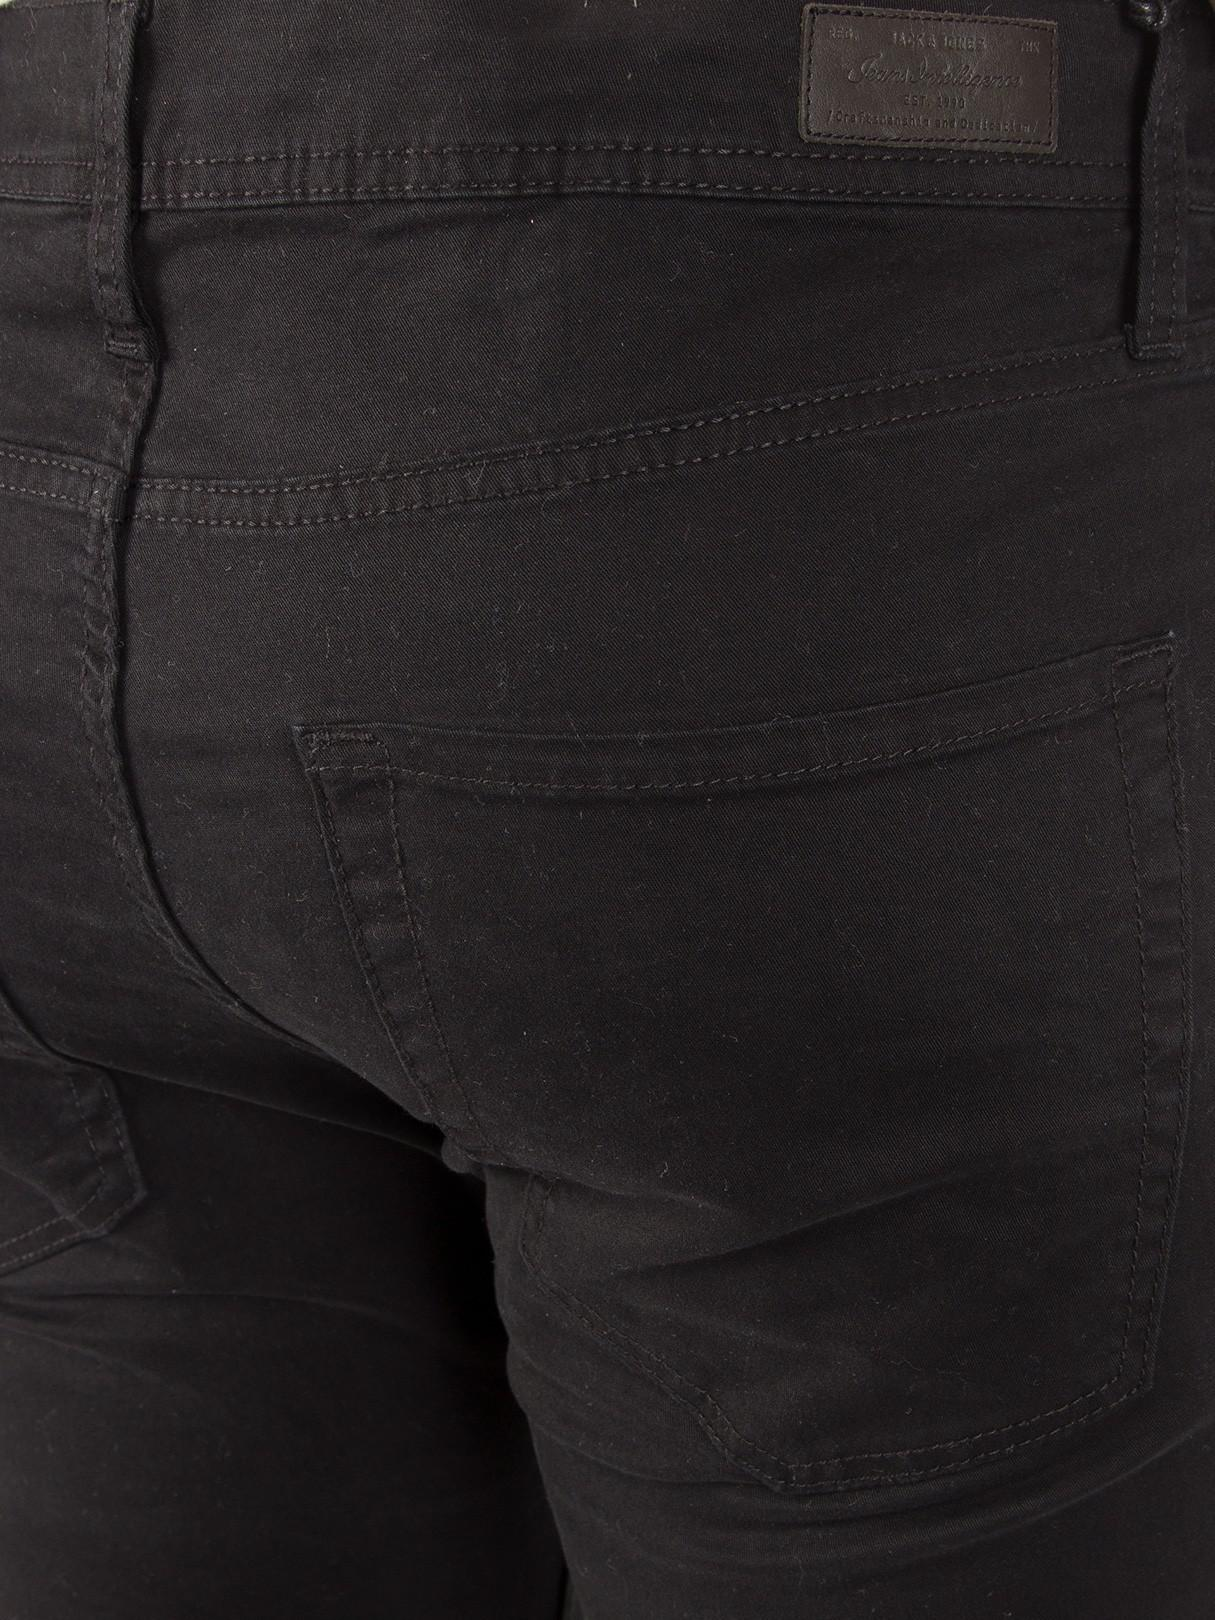 Jack & Jones Denim Black Tim 410 Slim Original Jeans for Men